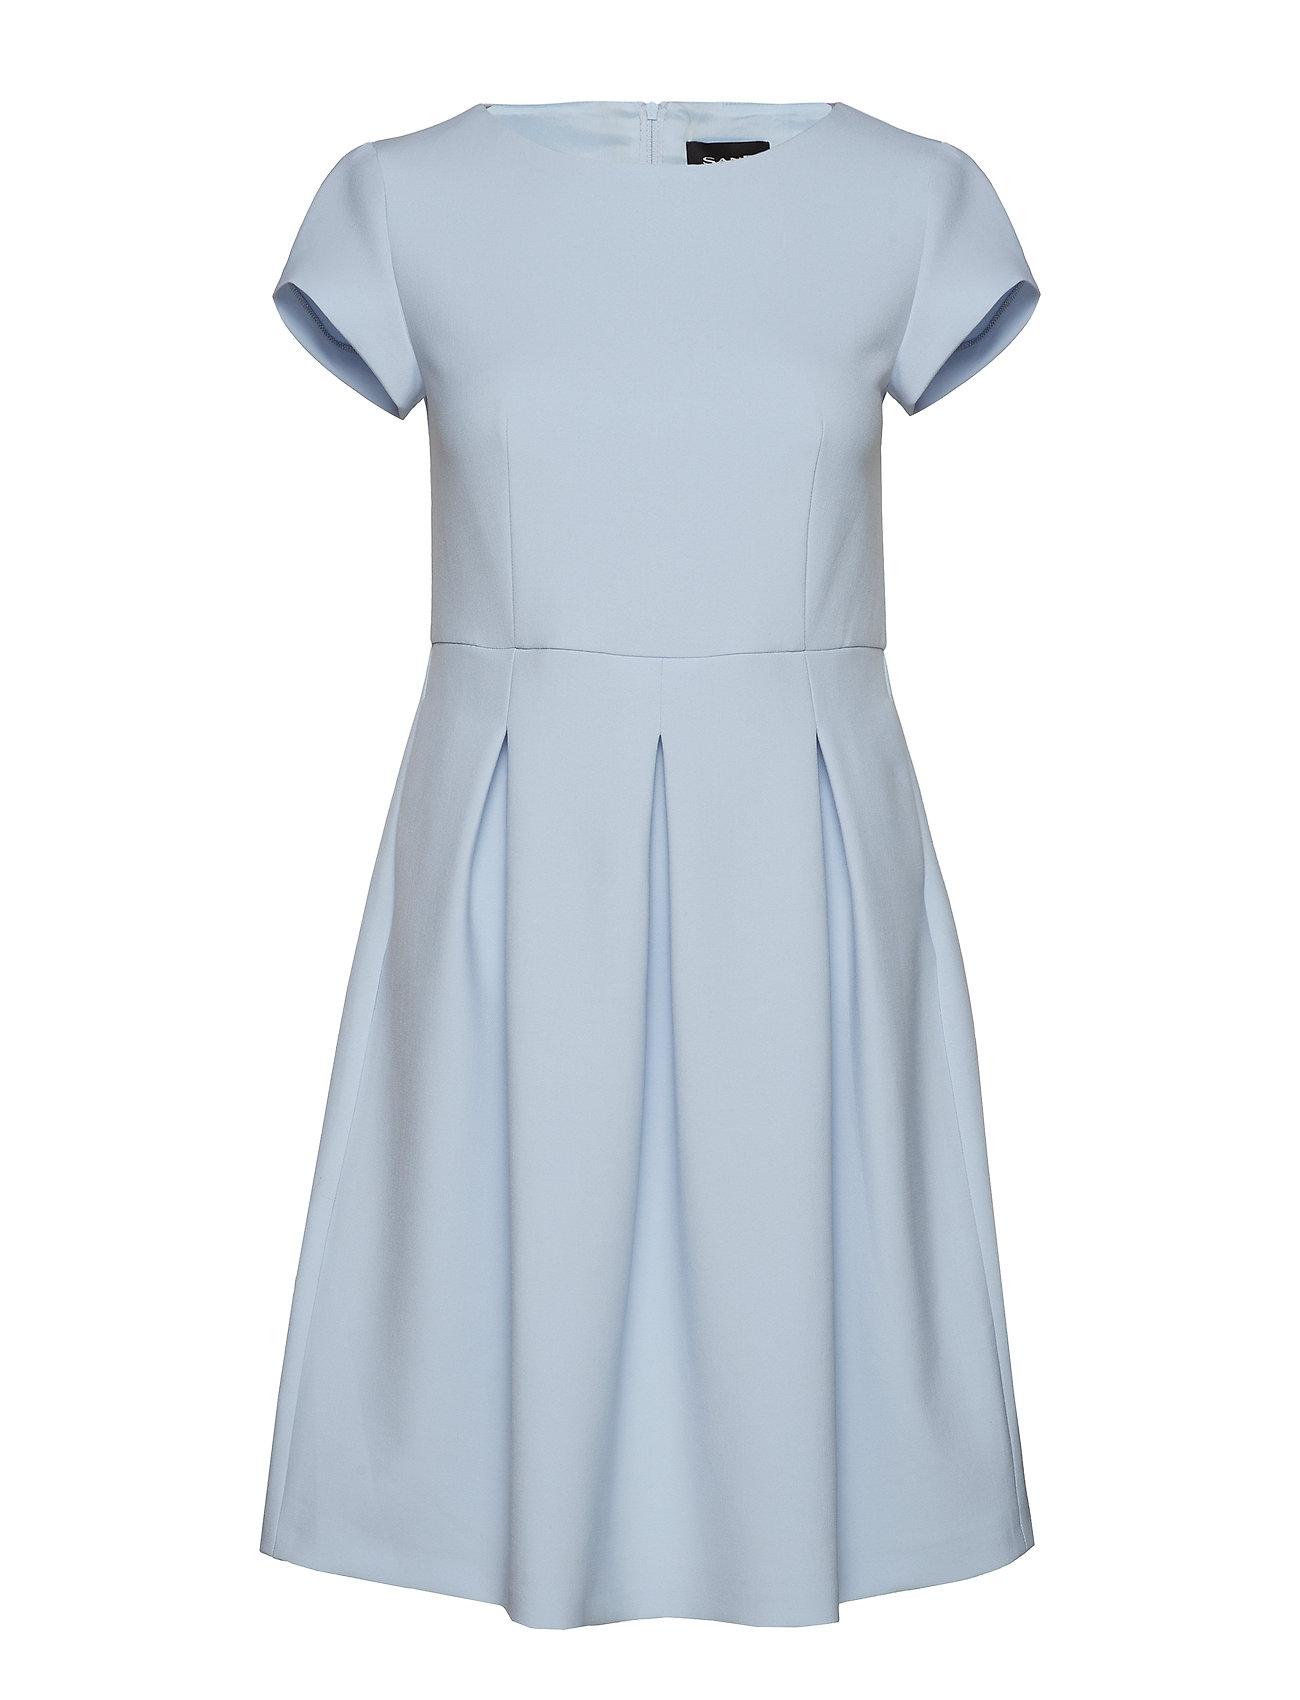 SAND 3596 Norma Dress Klänningar